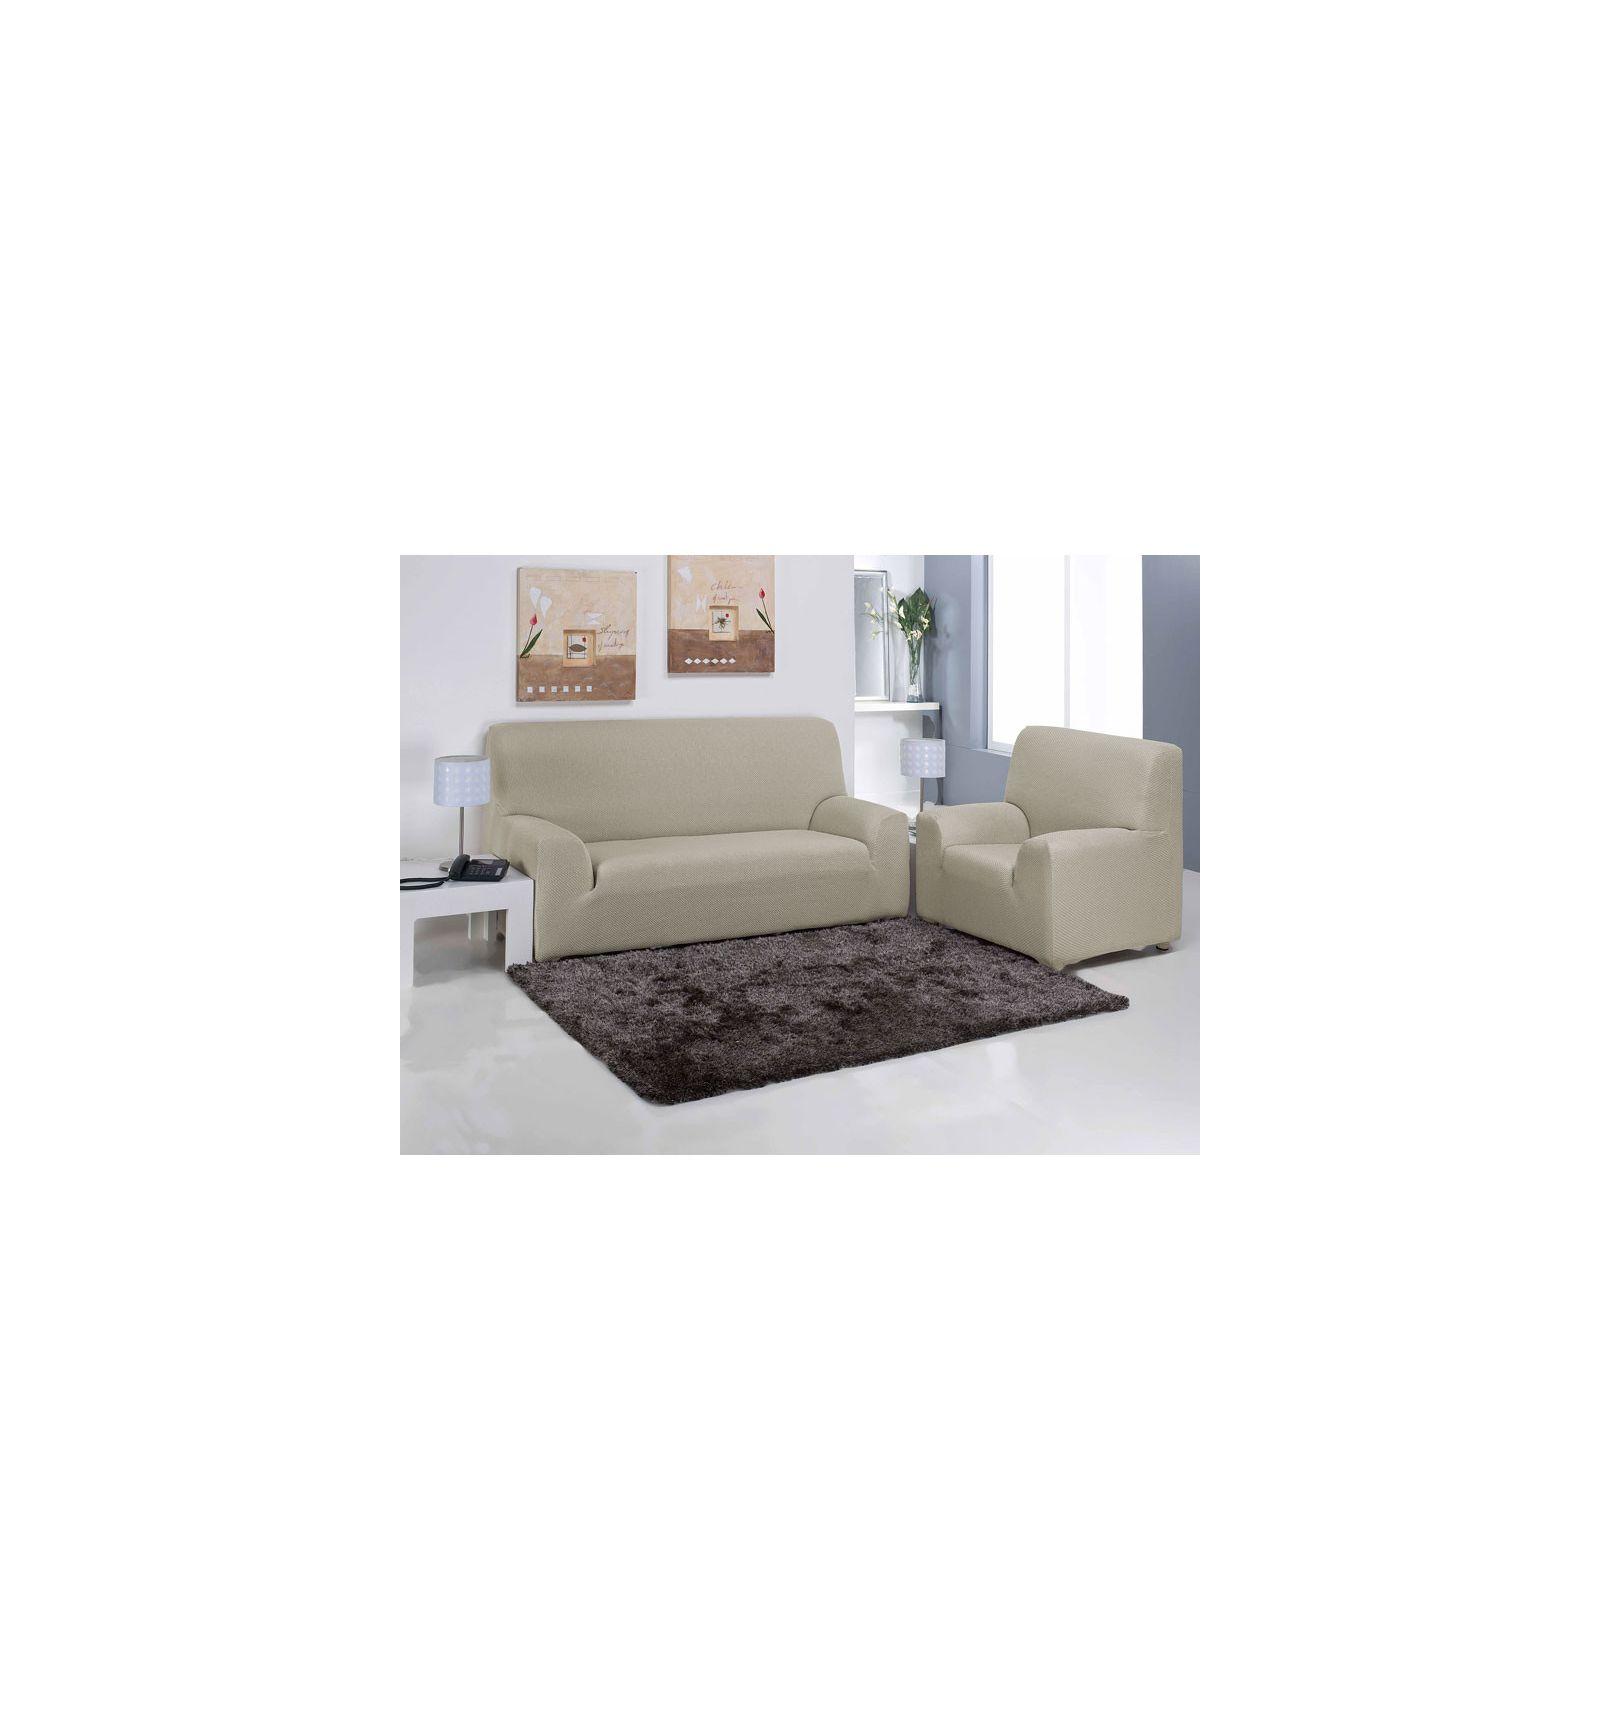 Funda sof carla beige funda sof ajustable revitex online - Fundas para sofa ...